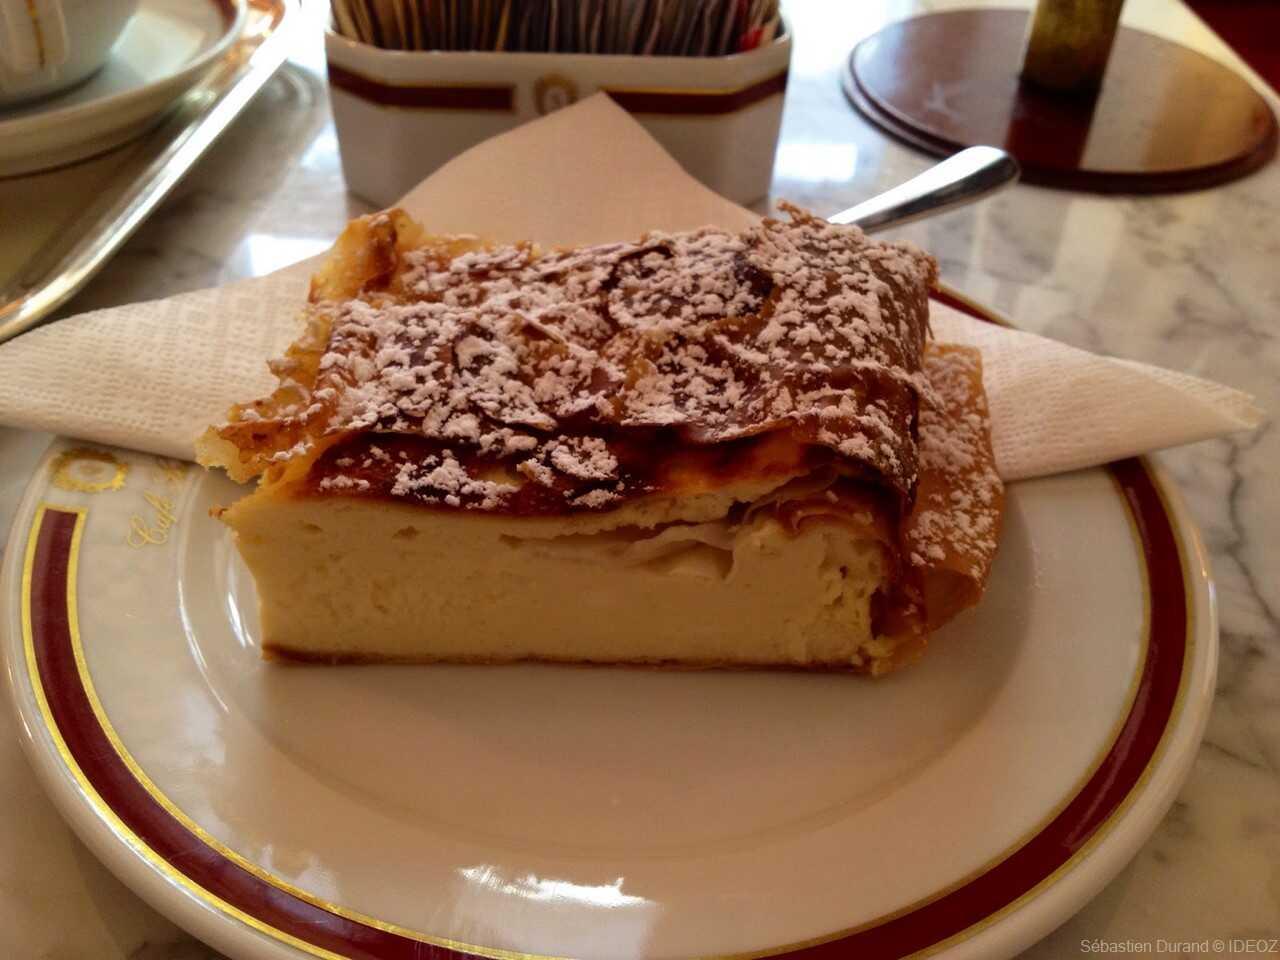 Topfen strudel au café Sacher d'Innsbrück